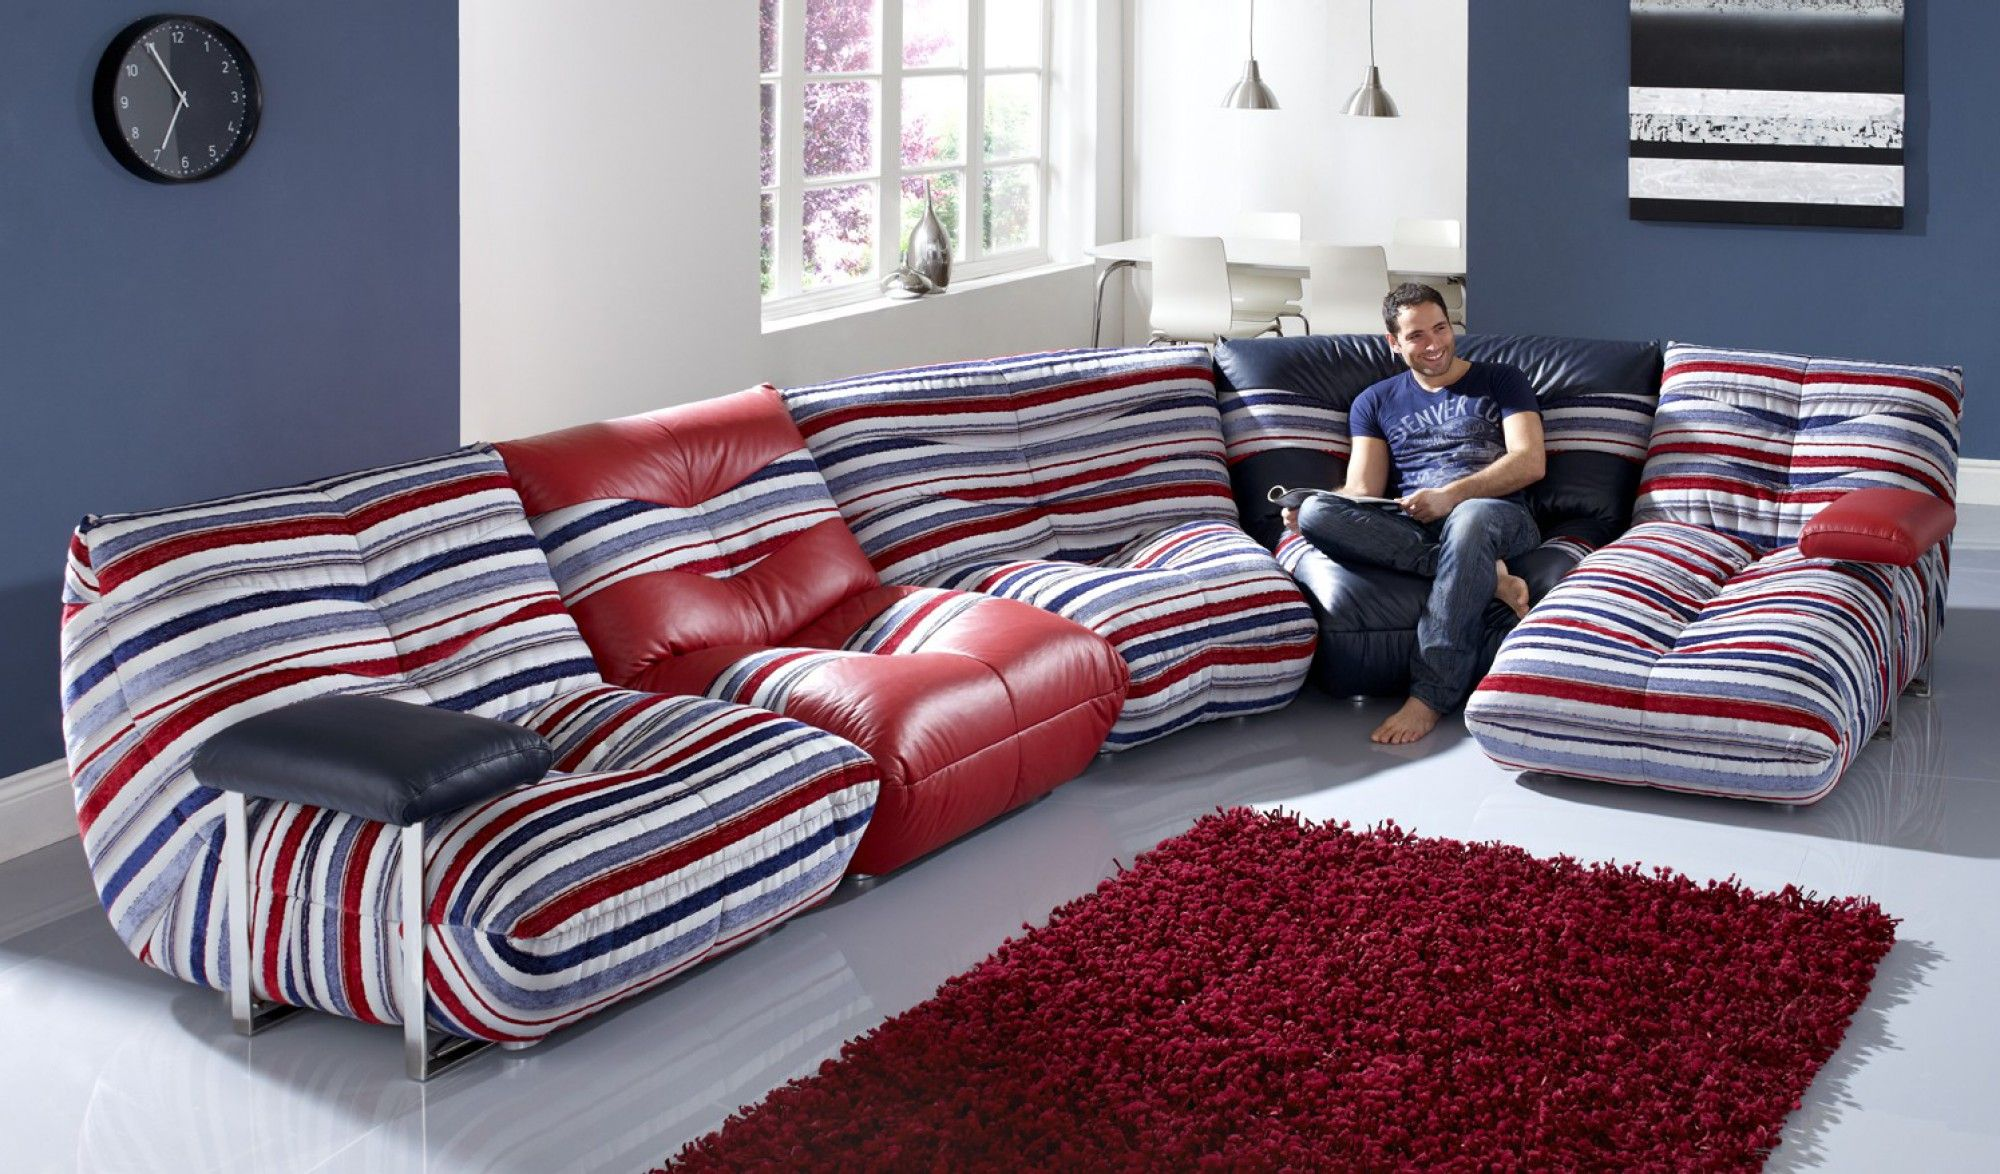 Admirable Leather Sofas Wave Csl Sofas Co Uk For The Home Creativecarmelina Interior Chair Design Creativecarmelinacom